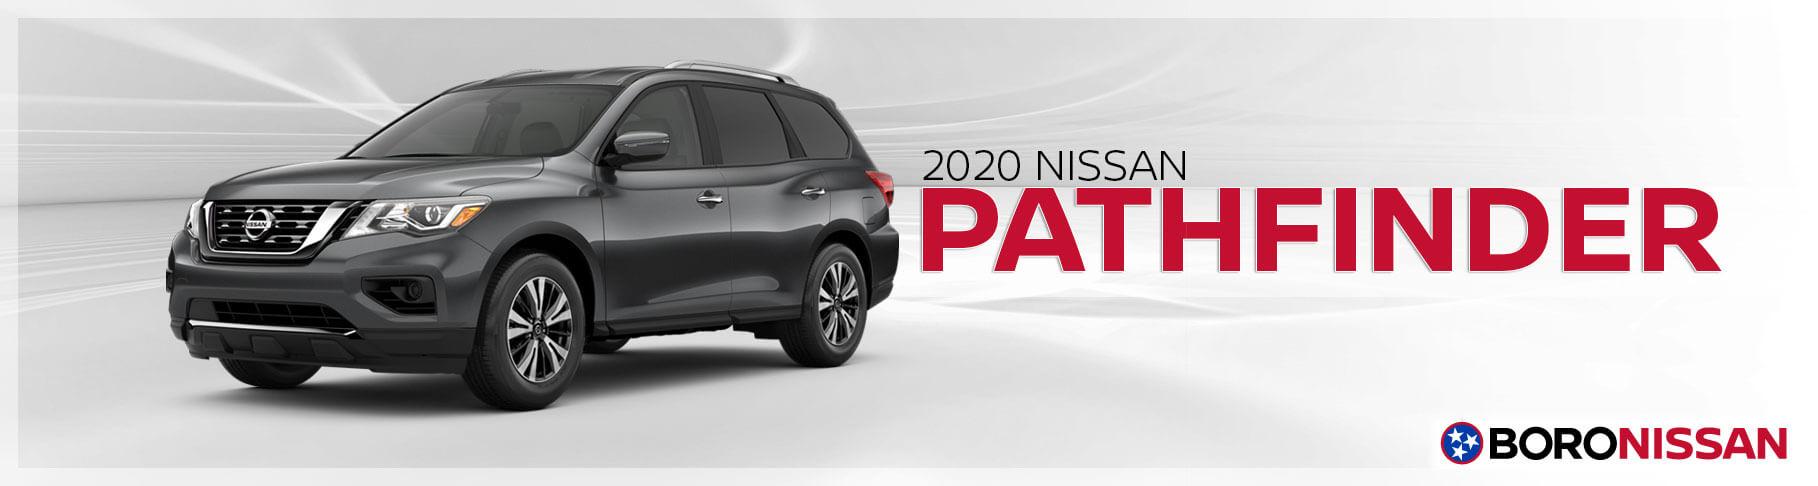 The 2020 Nissan Pathfinder